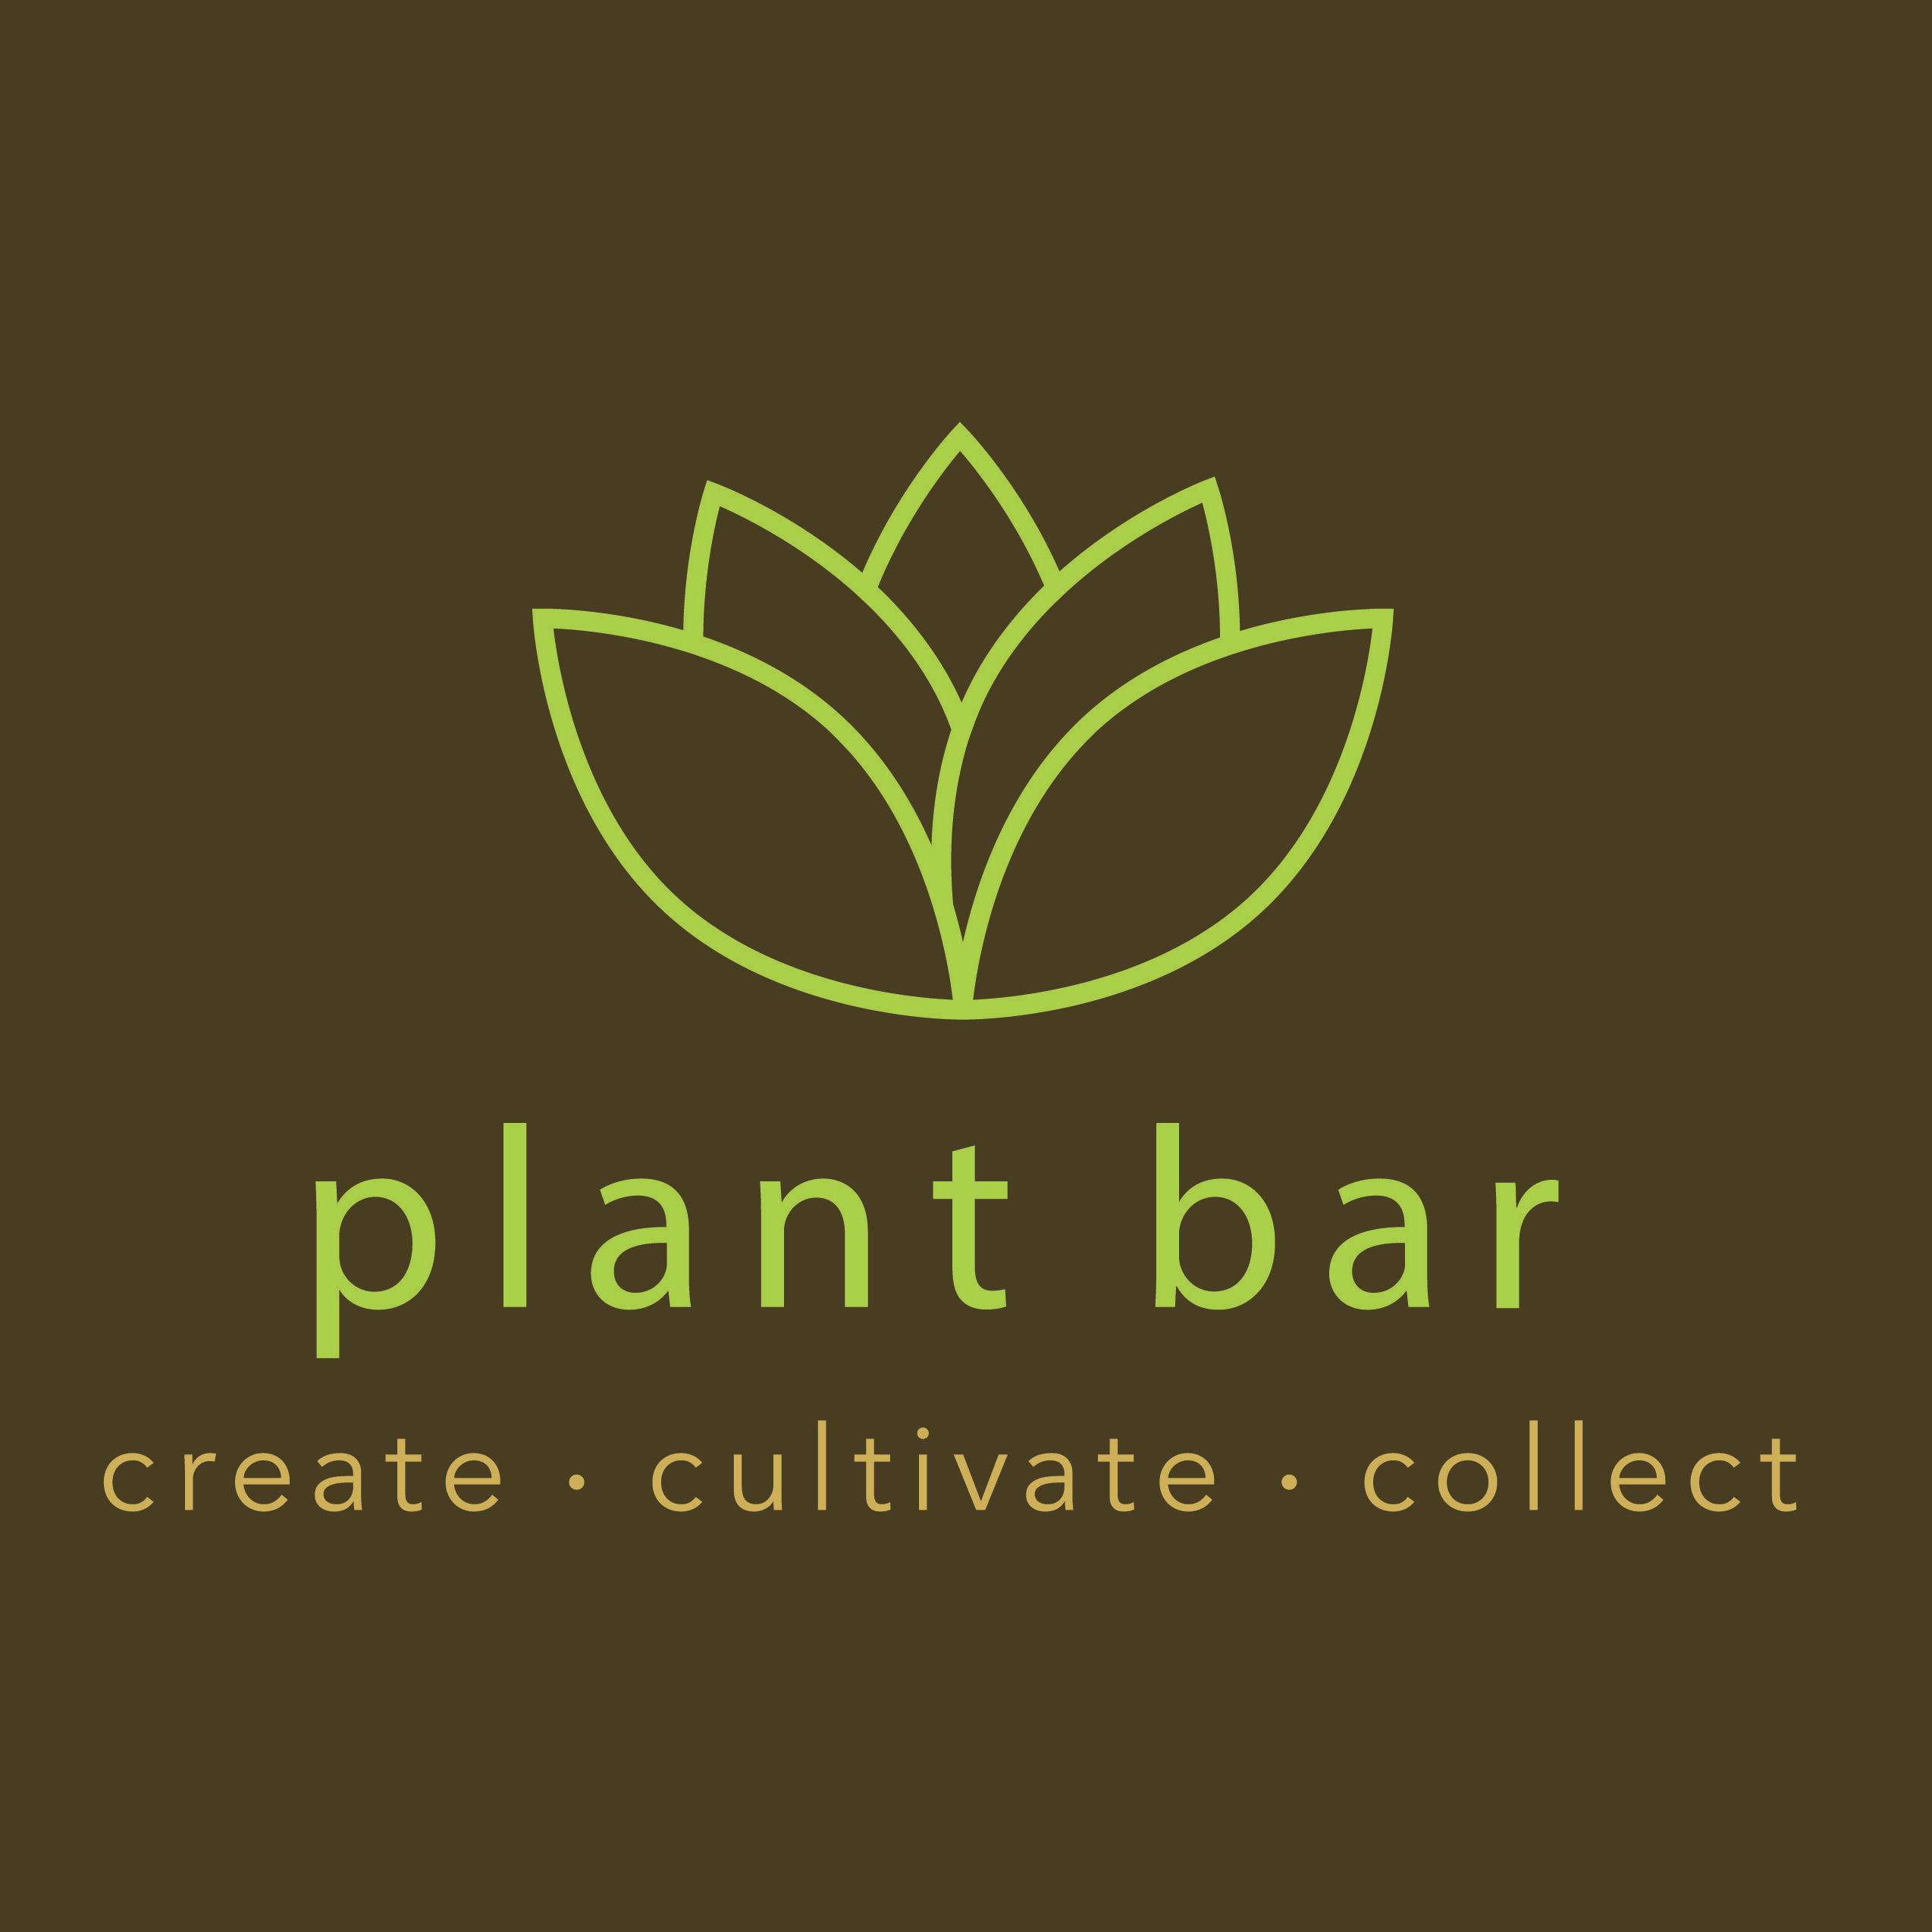 The Plant Bar